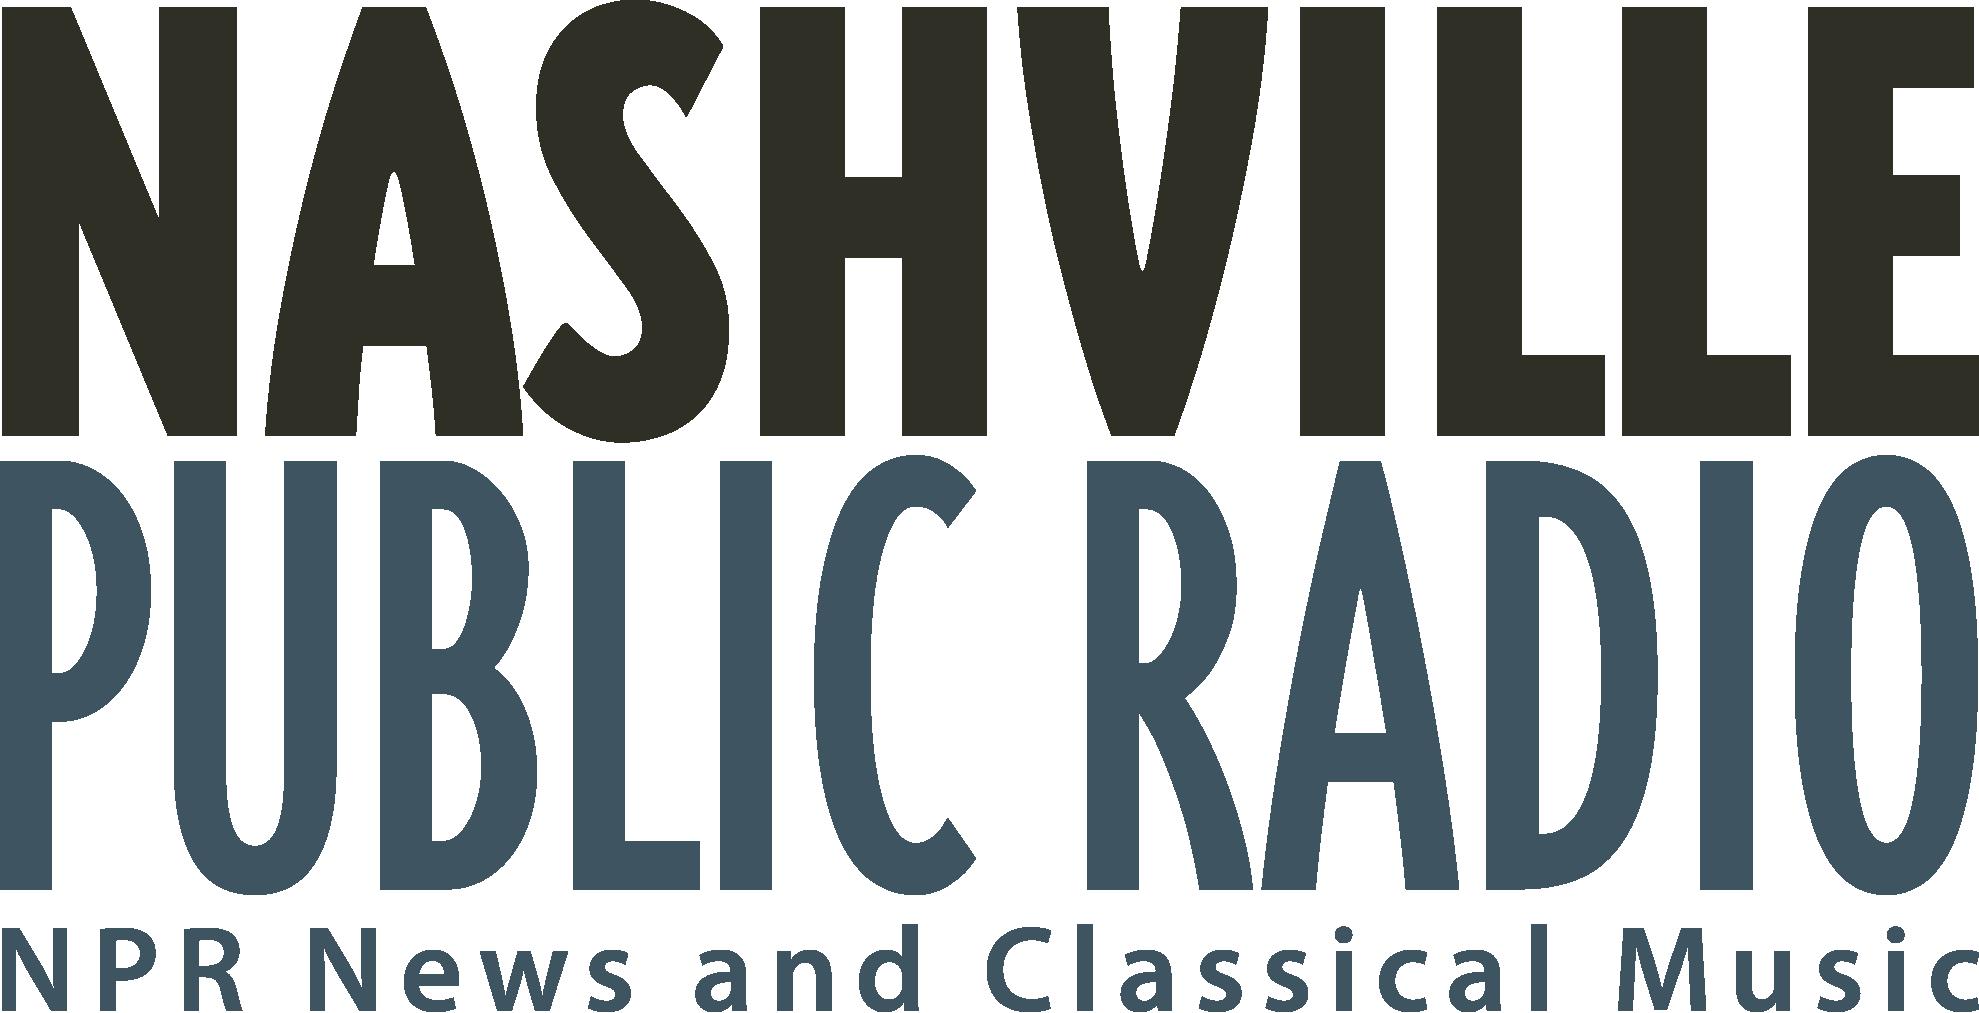 why a nashville handyman service went all in to hire veterans nashville public radio logo